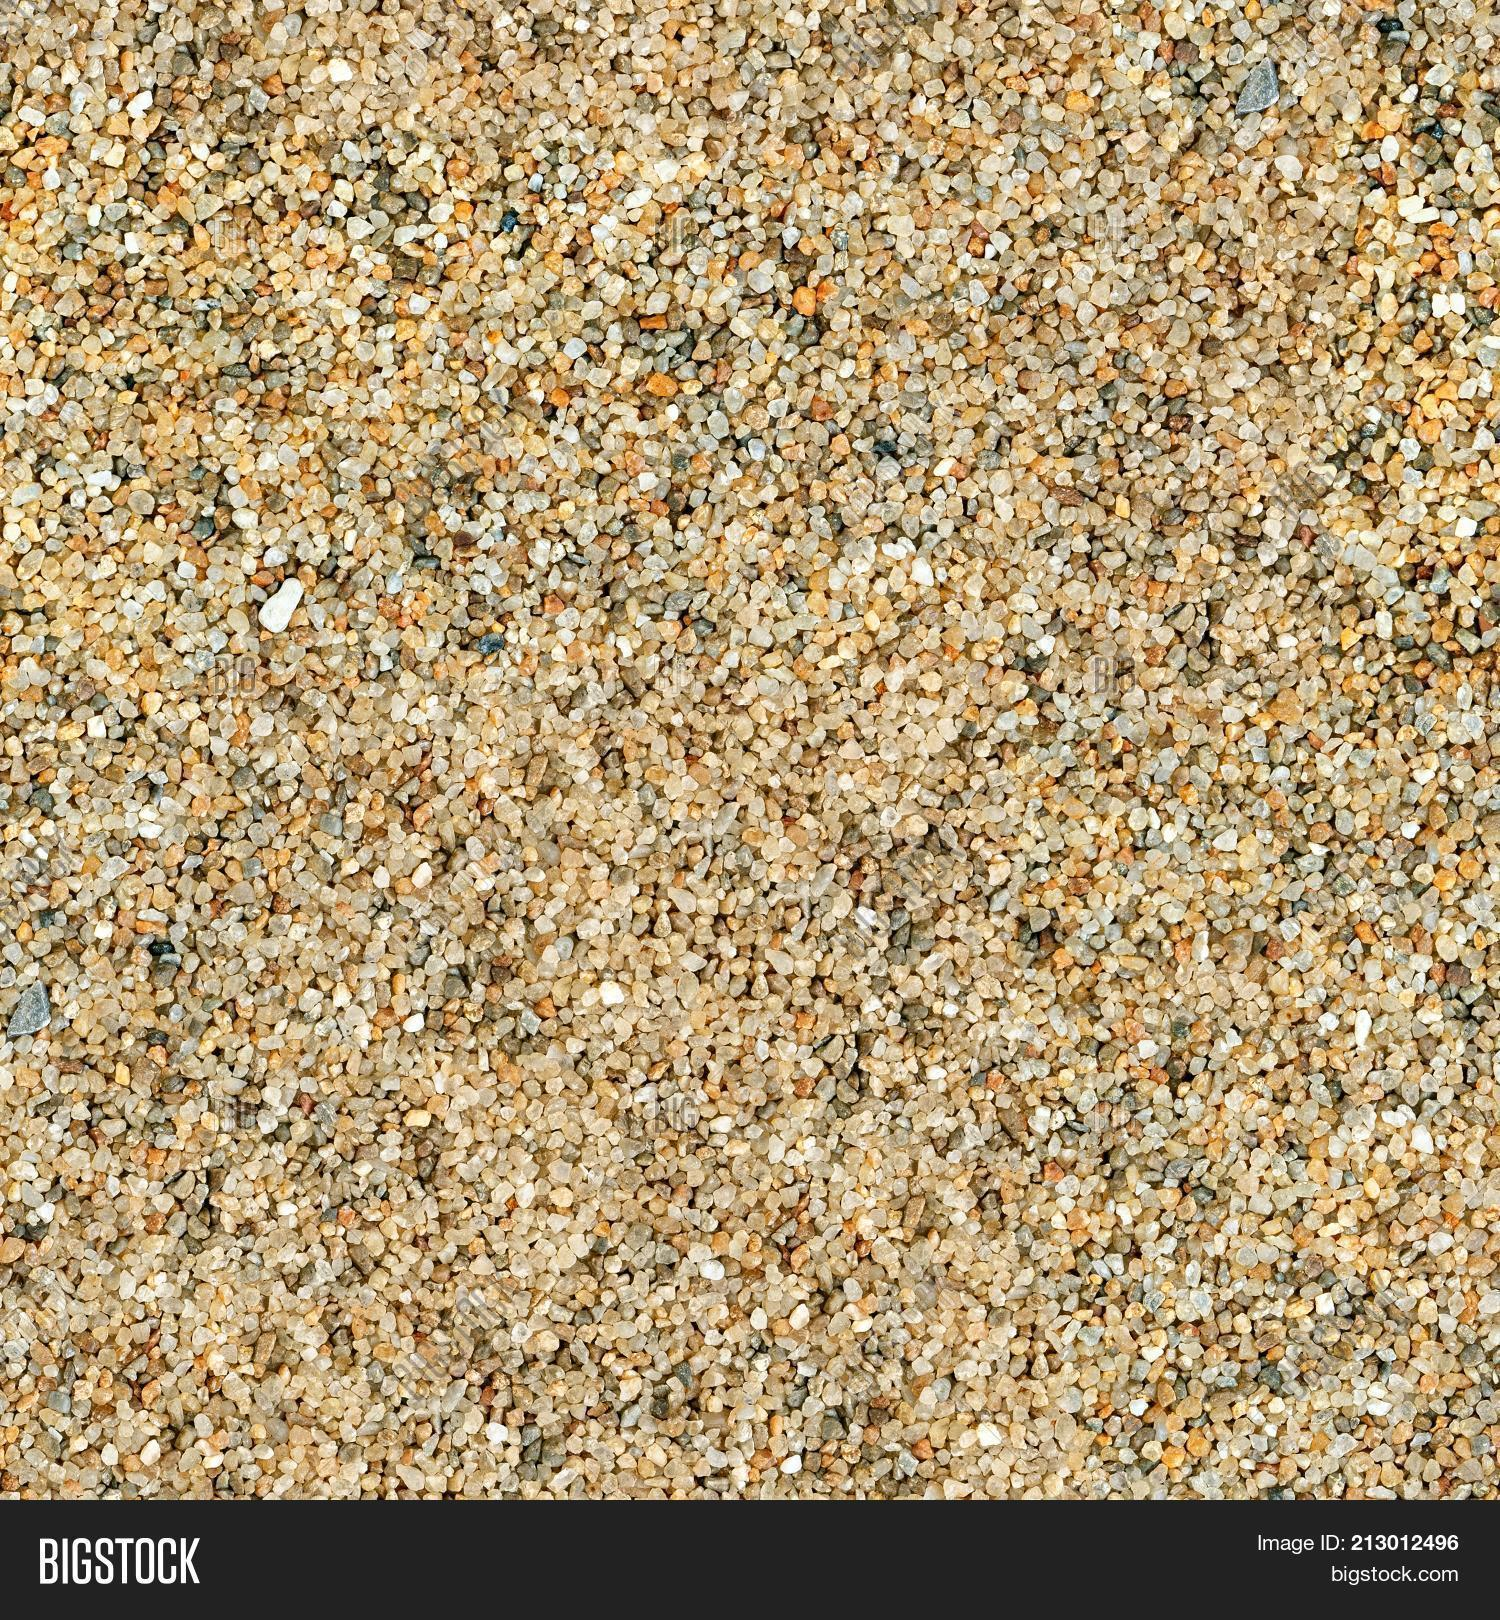 Quartz Sand Texture Image Photo Free Trial Bigstock